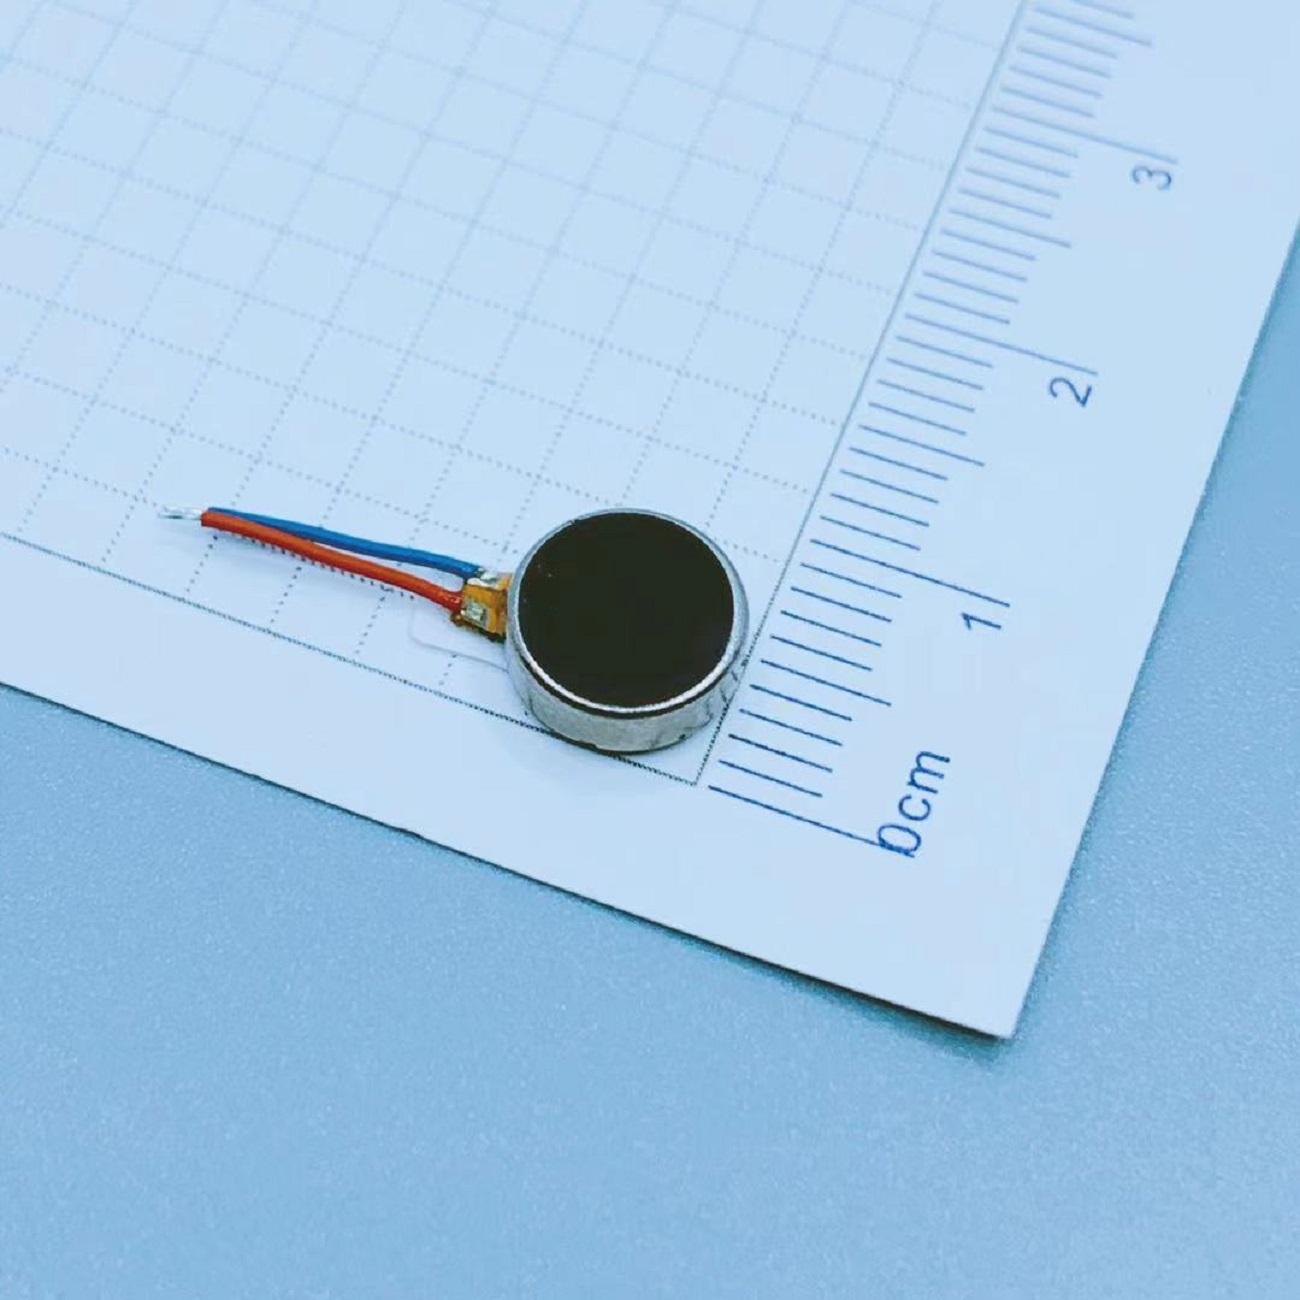 Dia 8*2.7mm Smallest Vibrate Motor    Iphone 6s Vibration Motor   LEADER LCM-0827